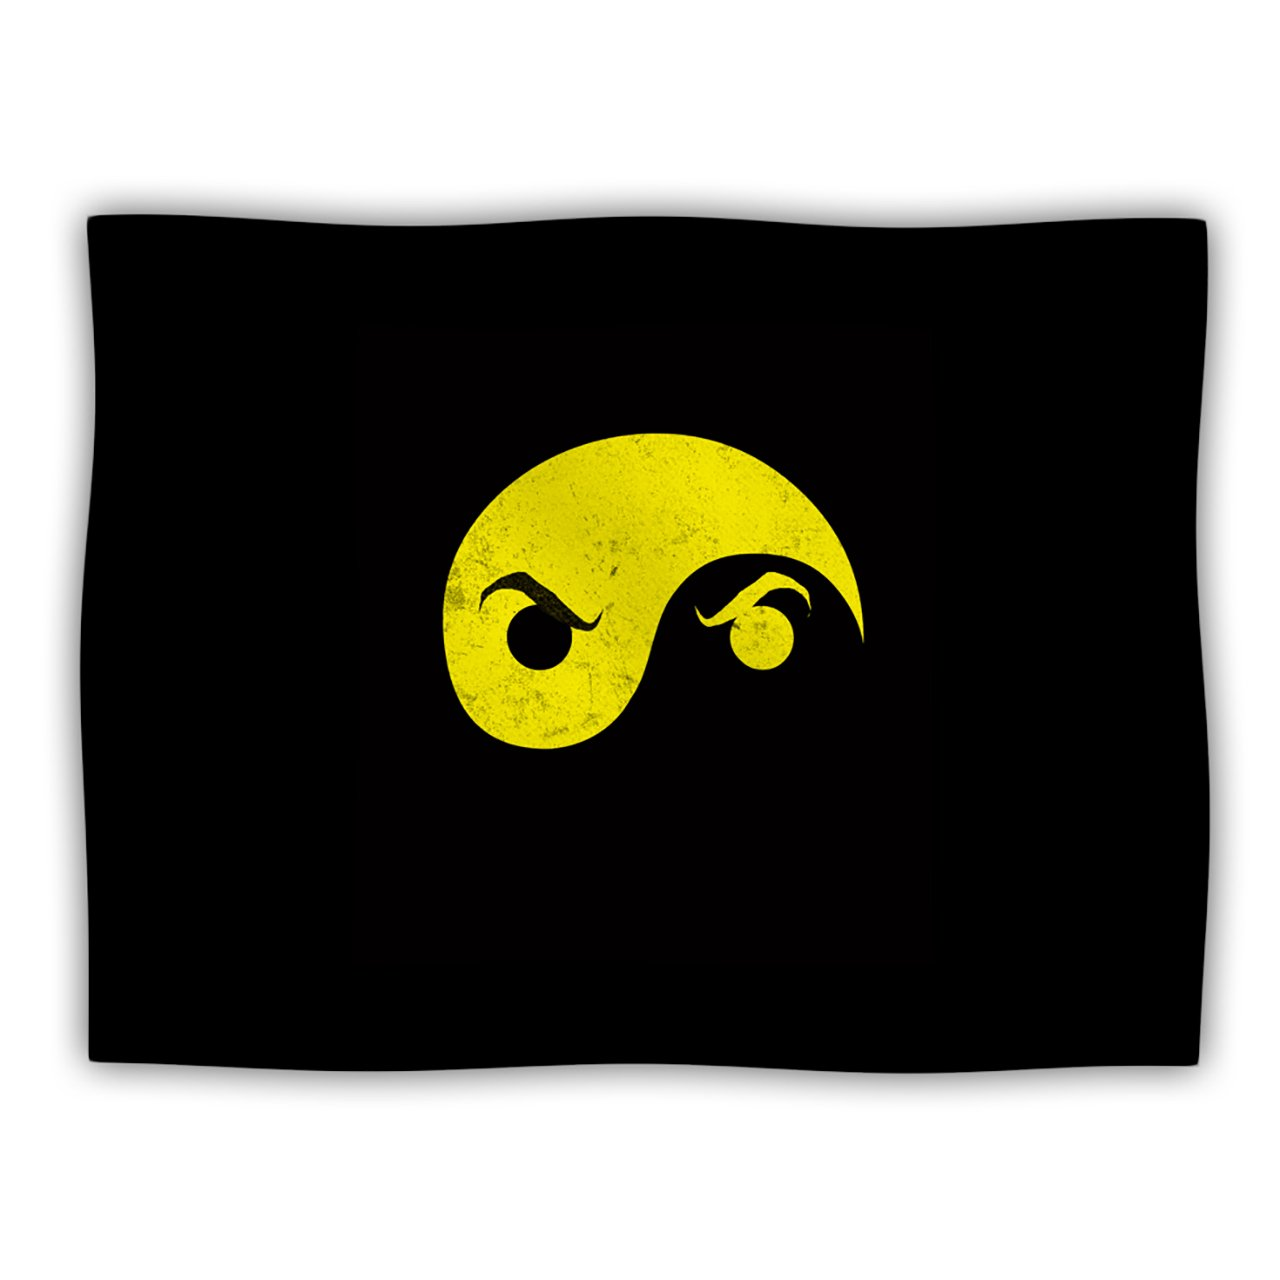 Kess InHouse Frederic Levy-Hadida Yin Yang Ninja  Pet Blanket, 40 by 30-Inch